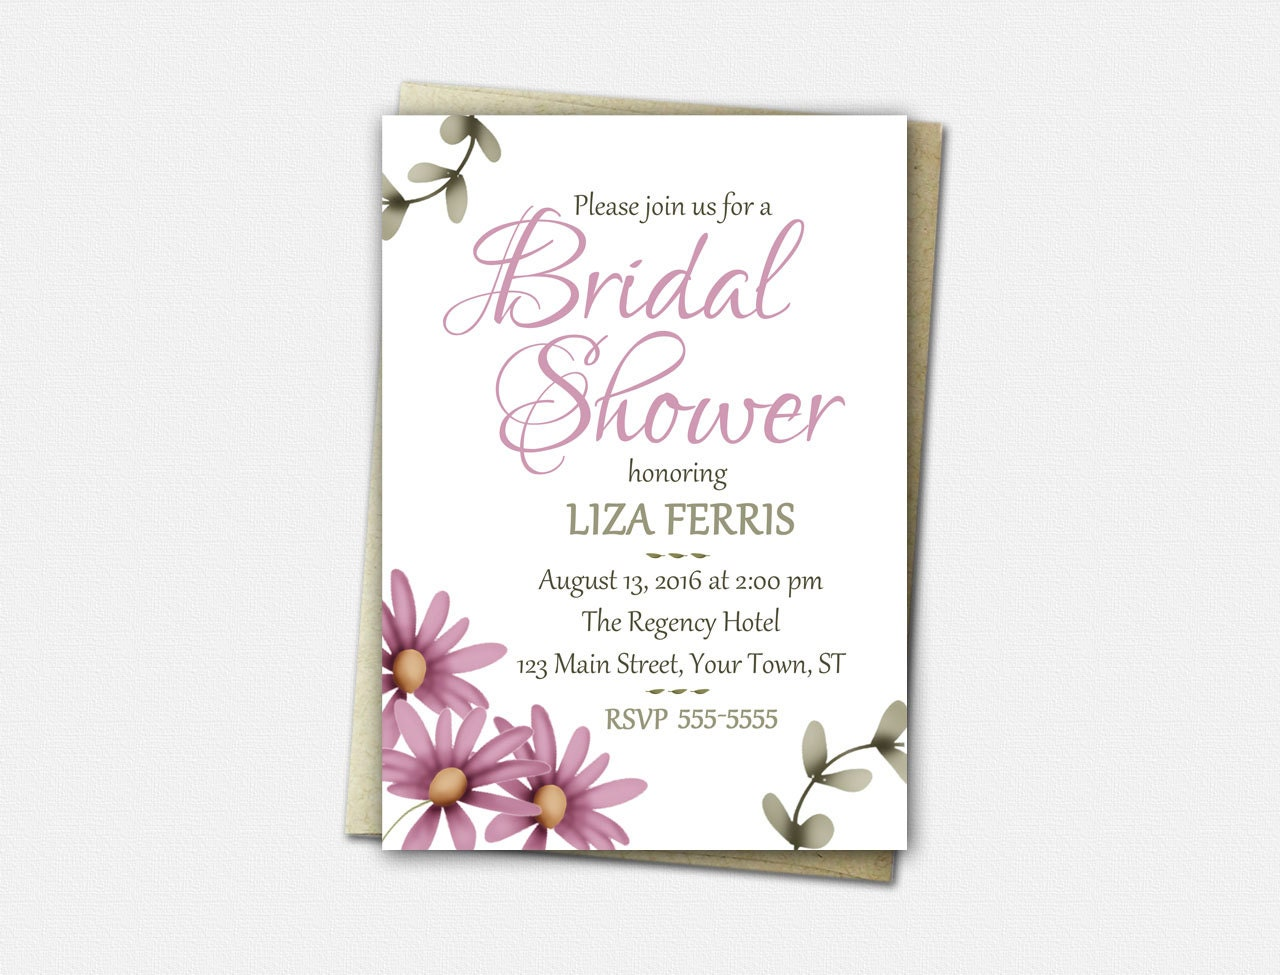 Wedding Shower Invitation: Bridal Shower Invitations Rustic Bridal Shower Invitation